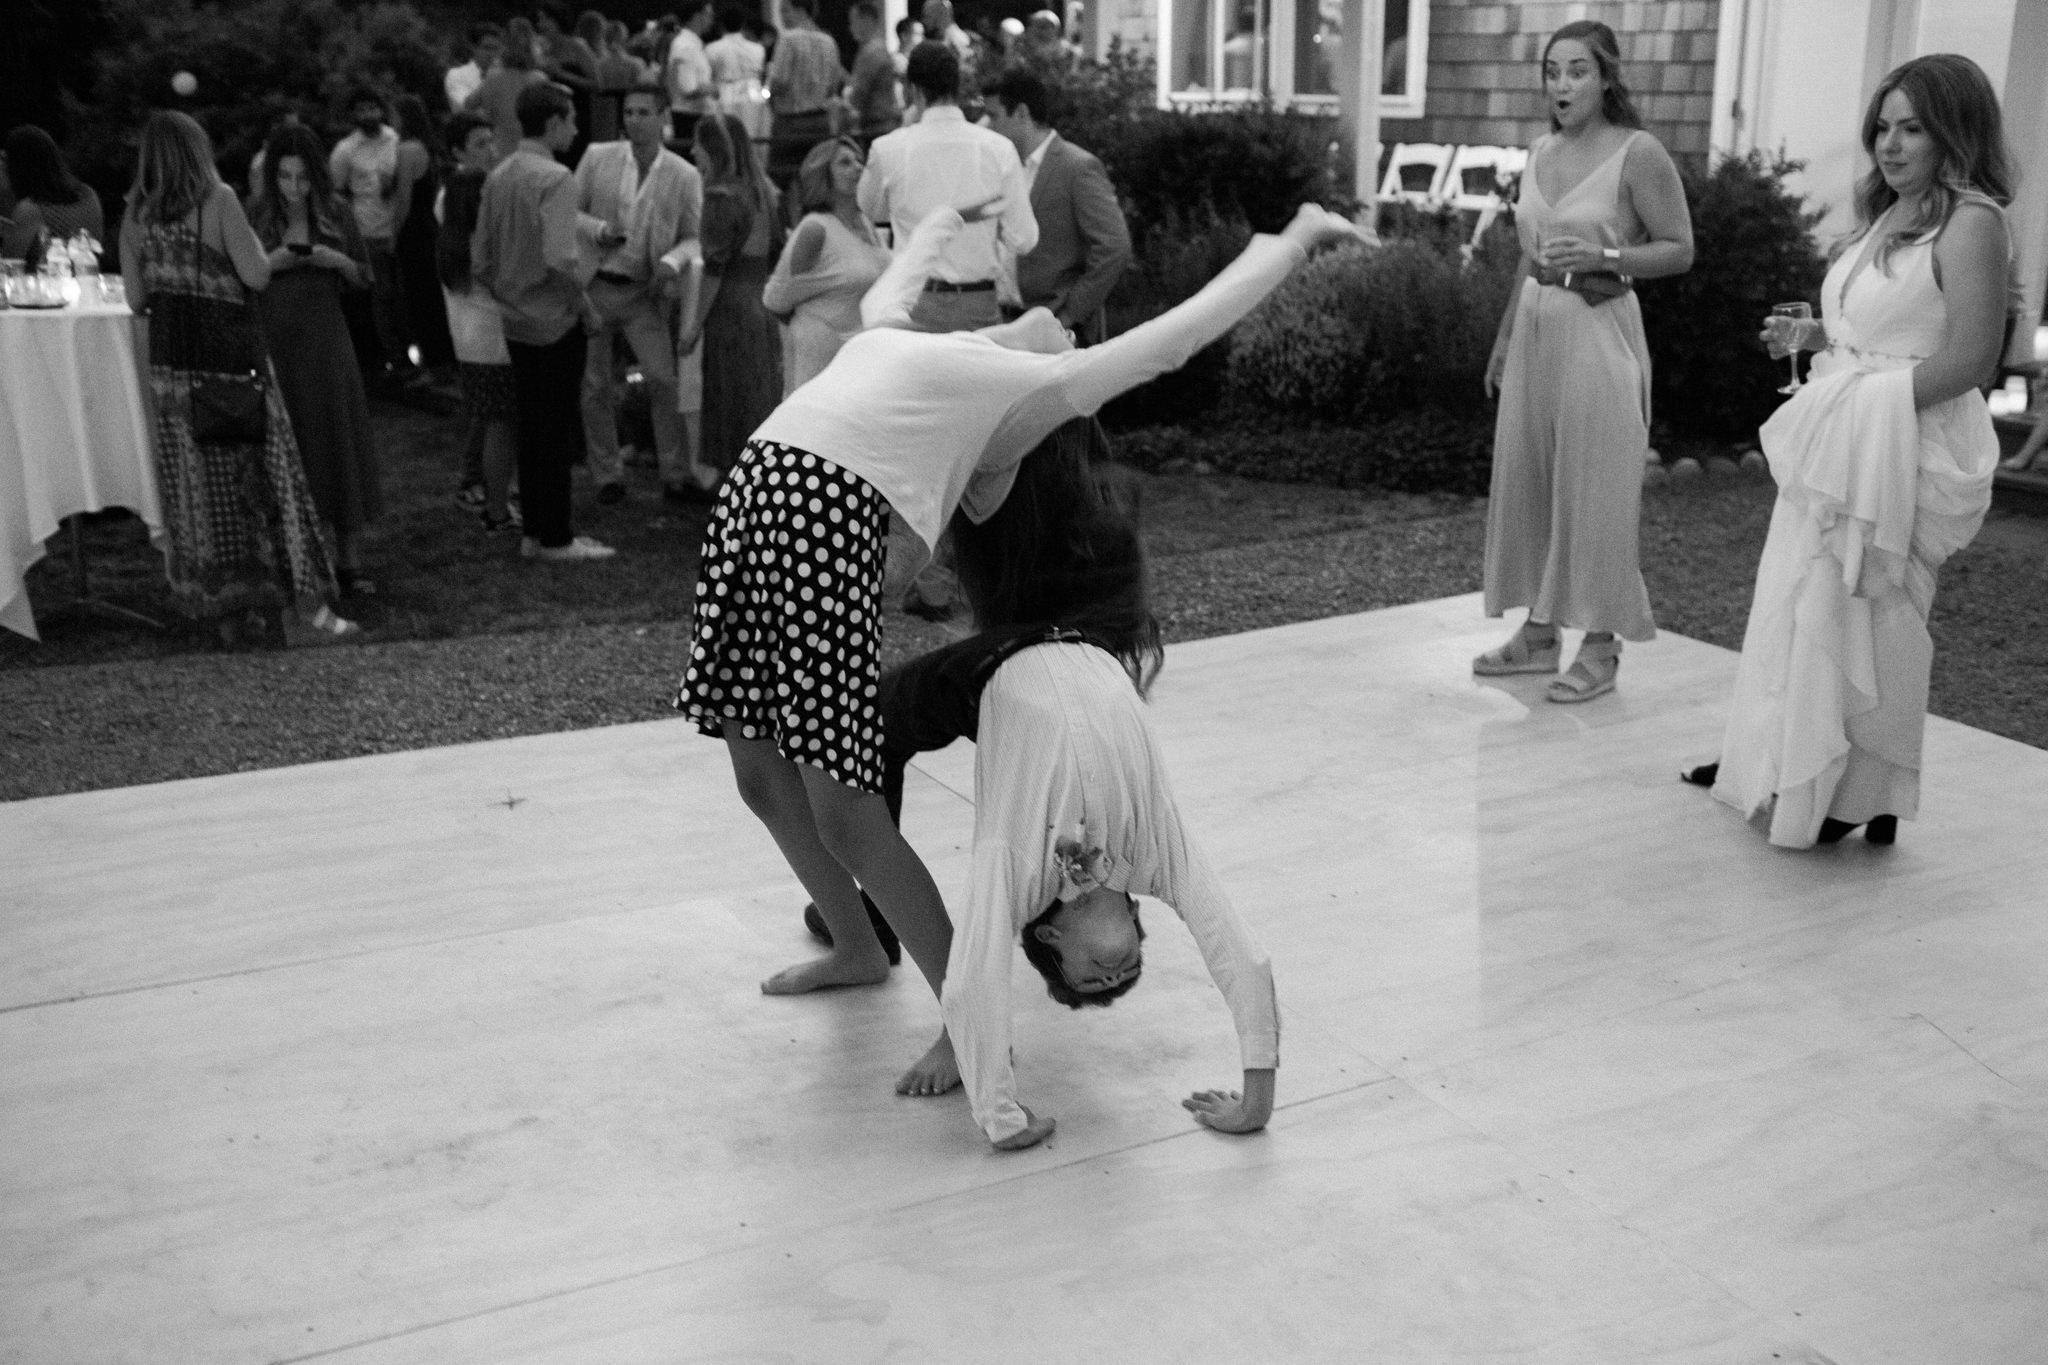 Backyard-Bainbridge-Island-Wedding-Alycia-Lovell-Photography-252.JPG